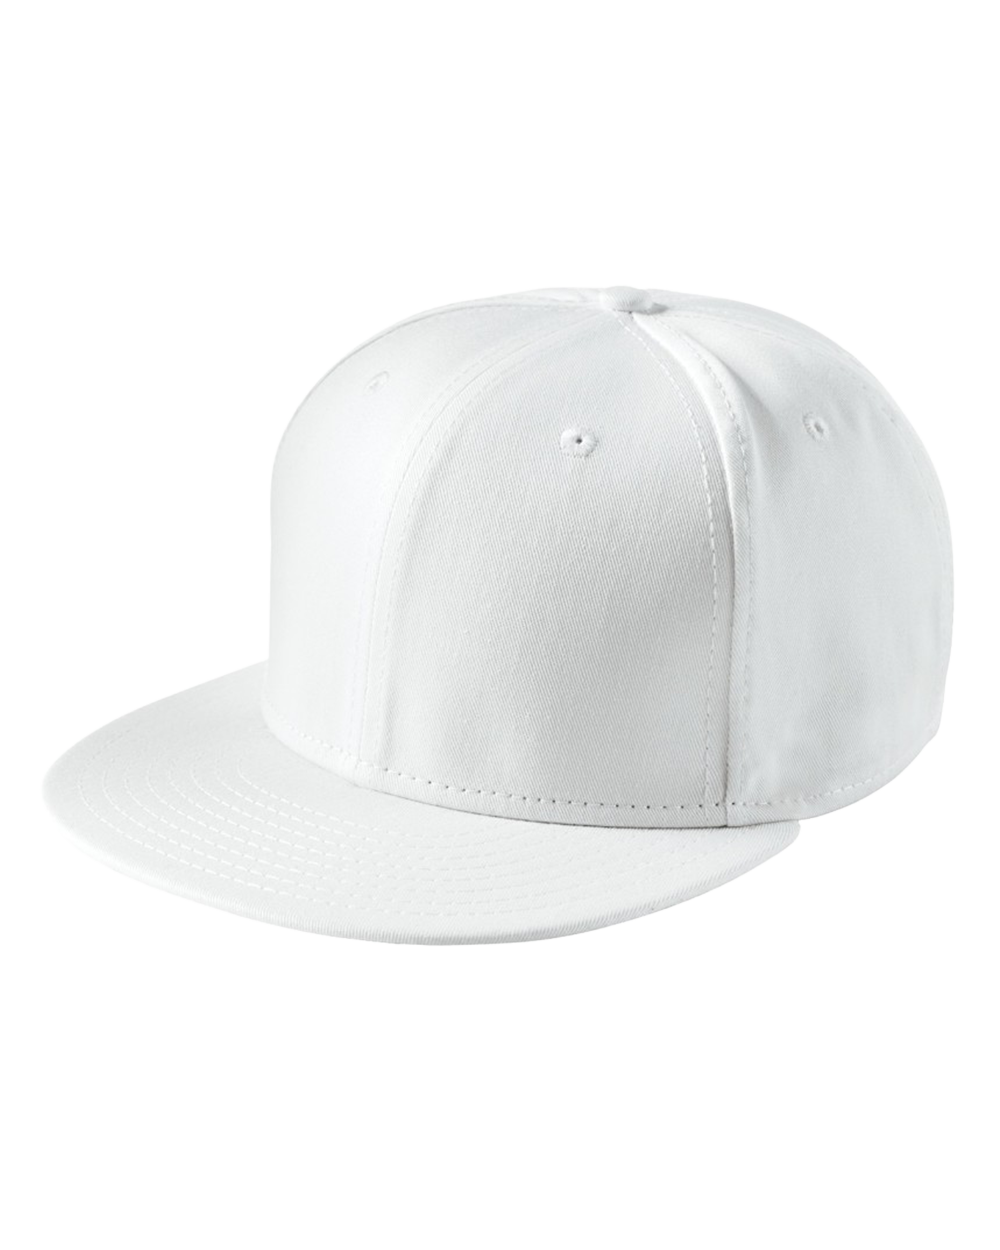 Flat Bill Snapback Cap